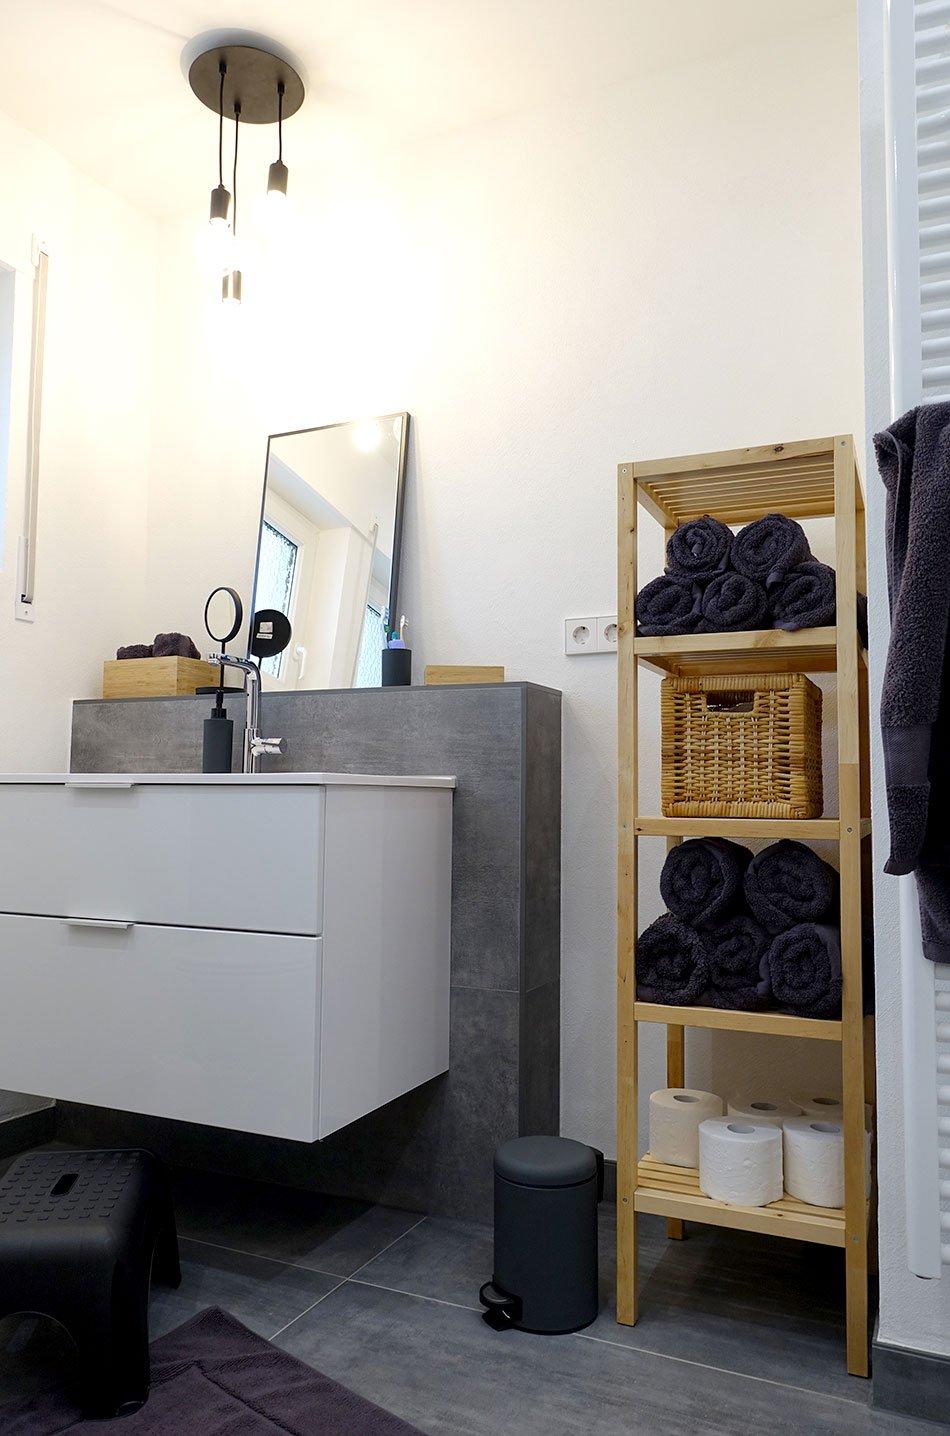 Unser Neues Badezimmer Xxl Fliesen In Betonoptik Ekulele